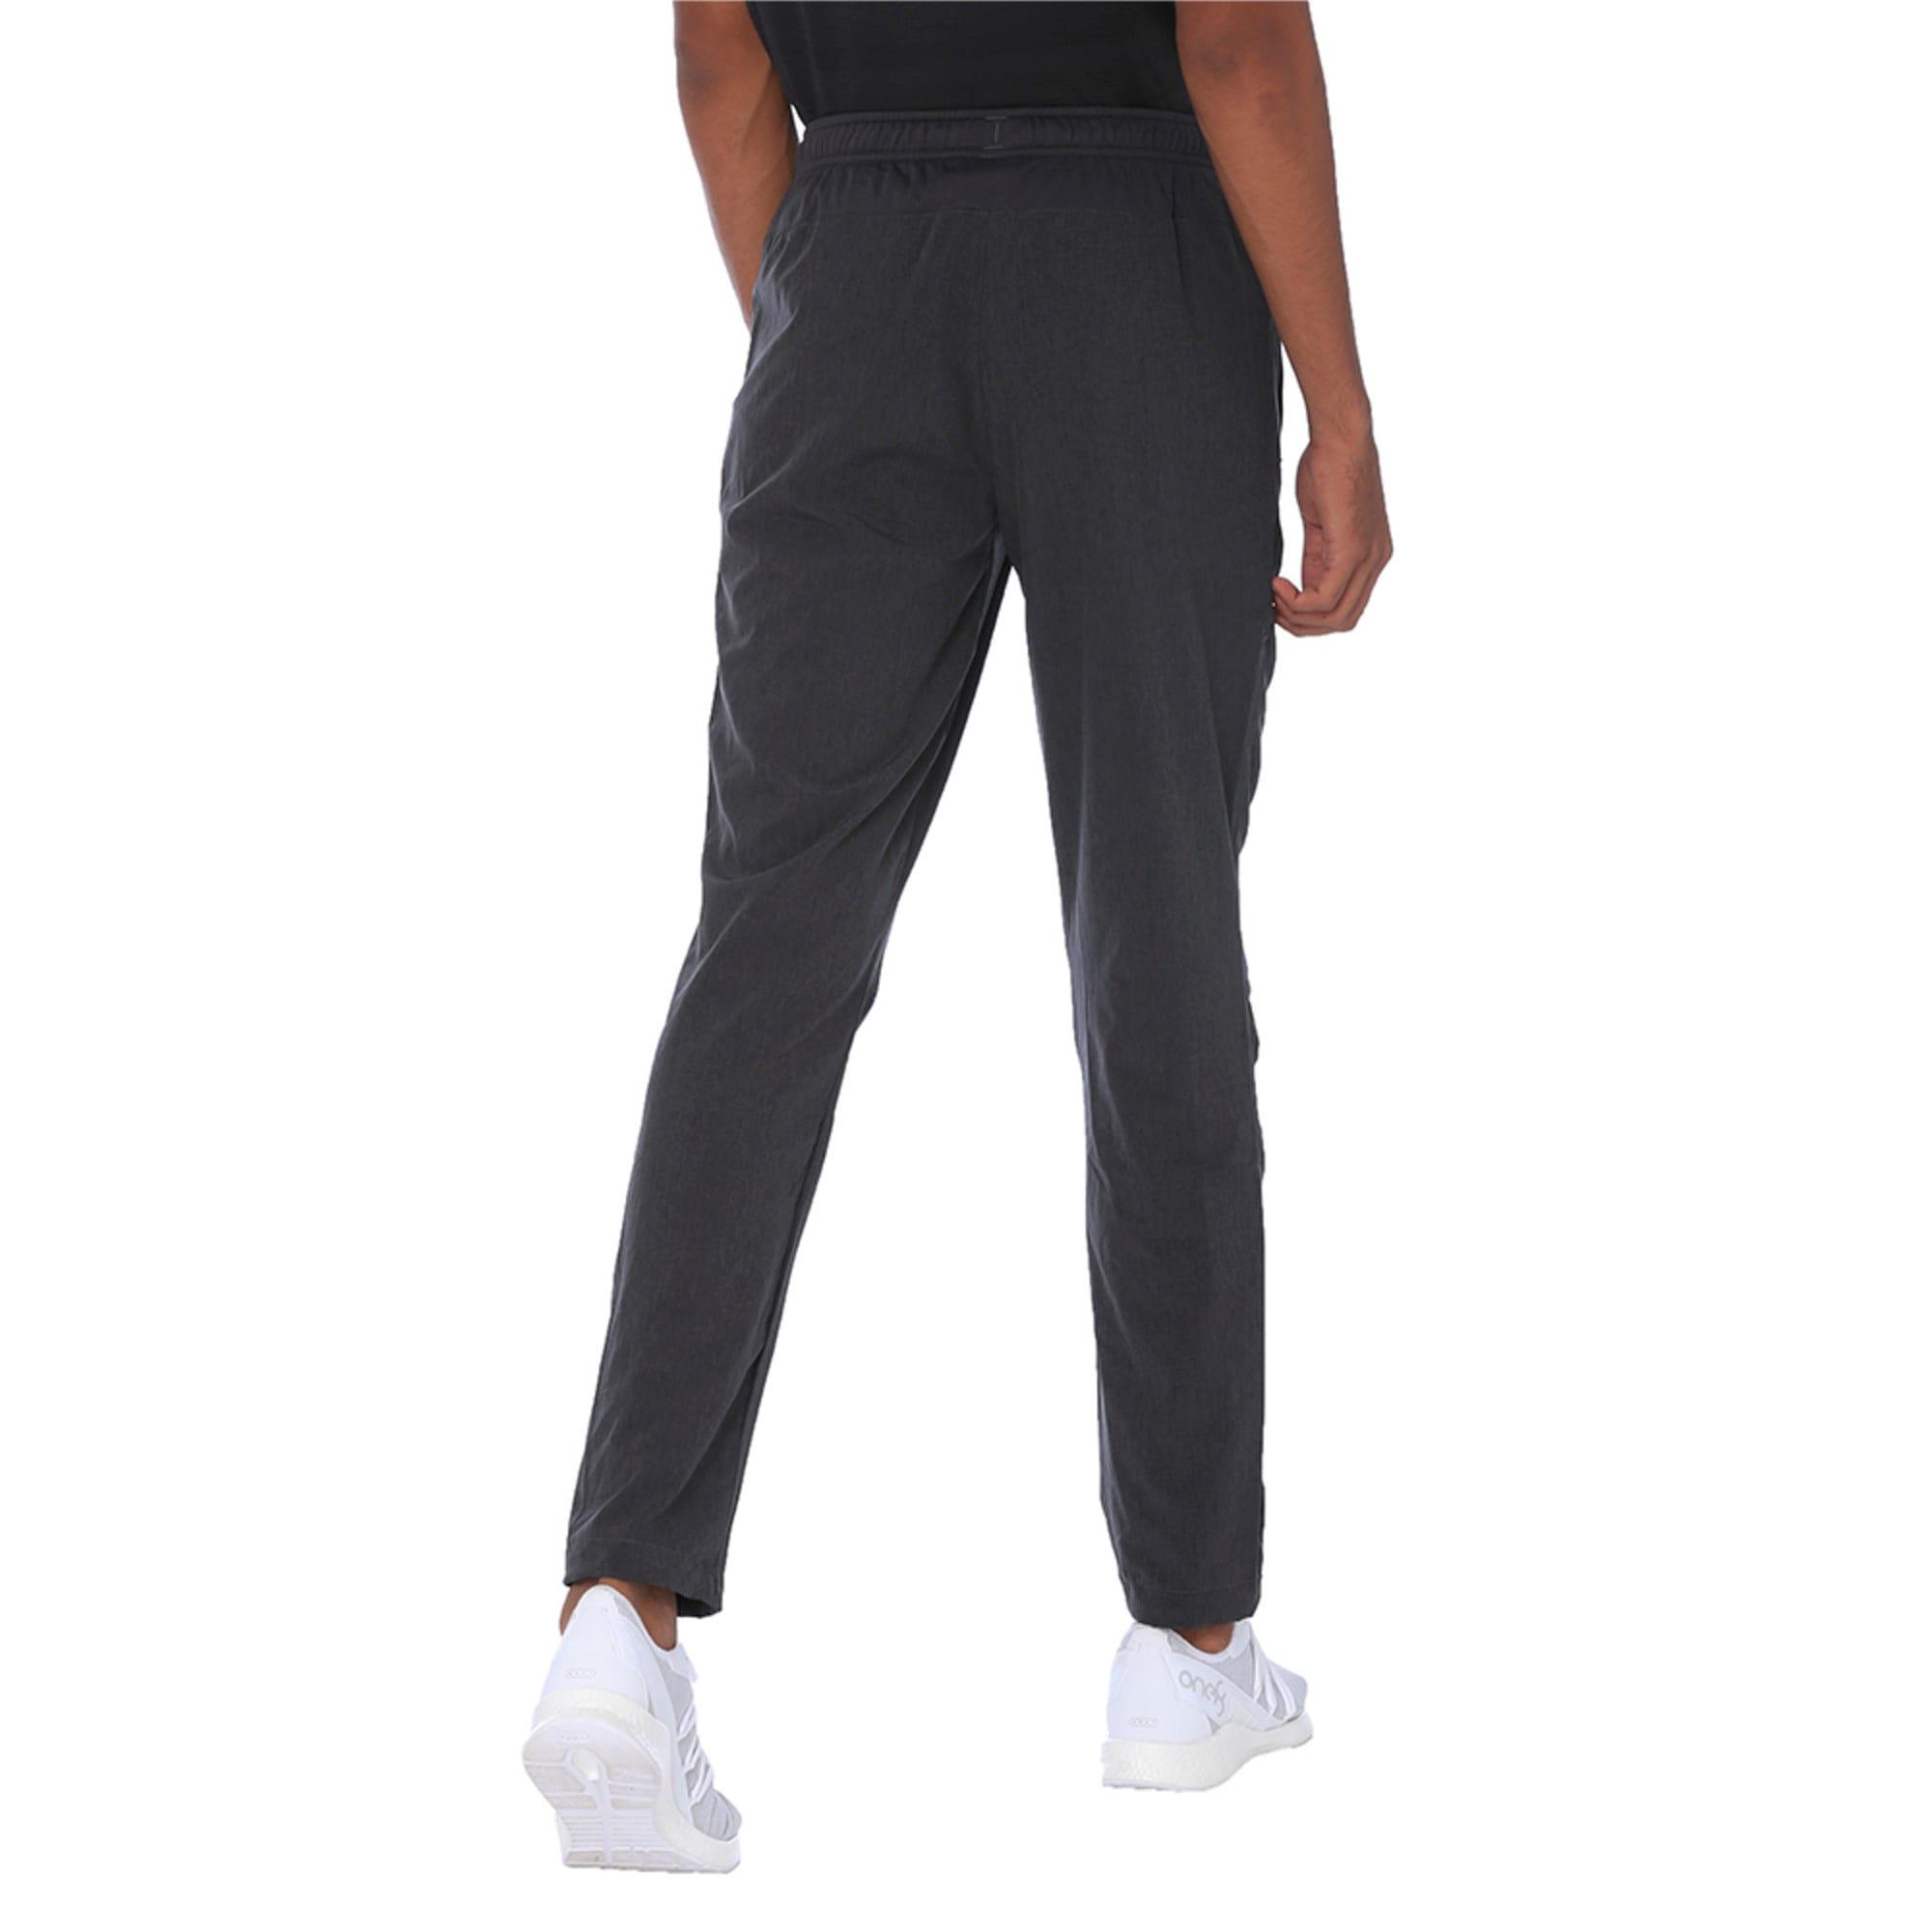 Thumbnail 5 of one8 VK Men's Active Pants, Dark Gray Heather, medium-IND